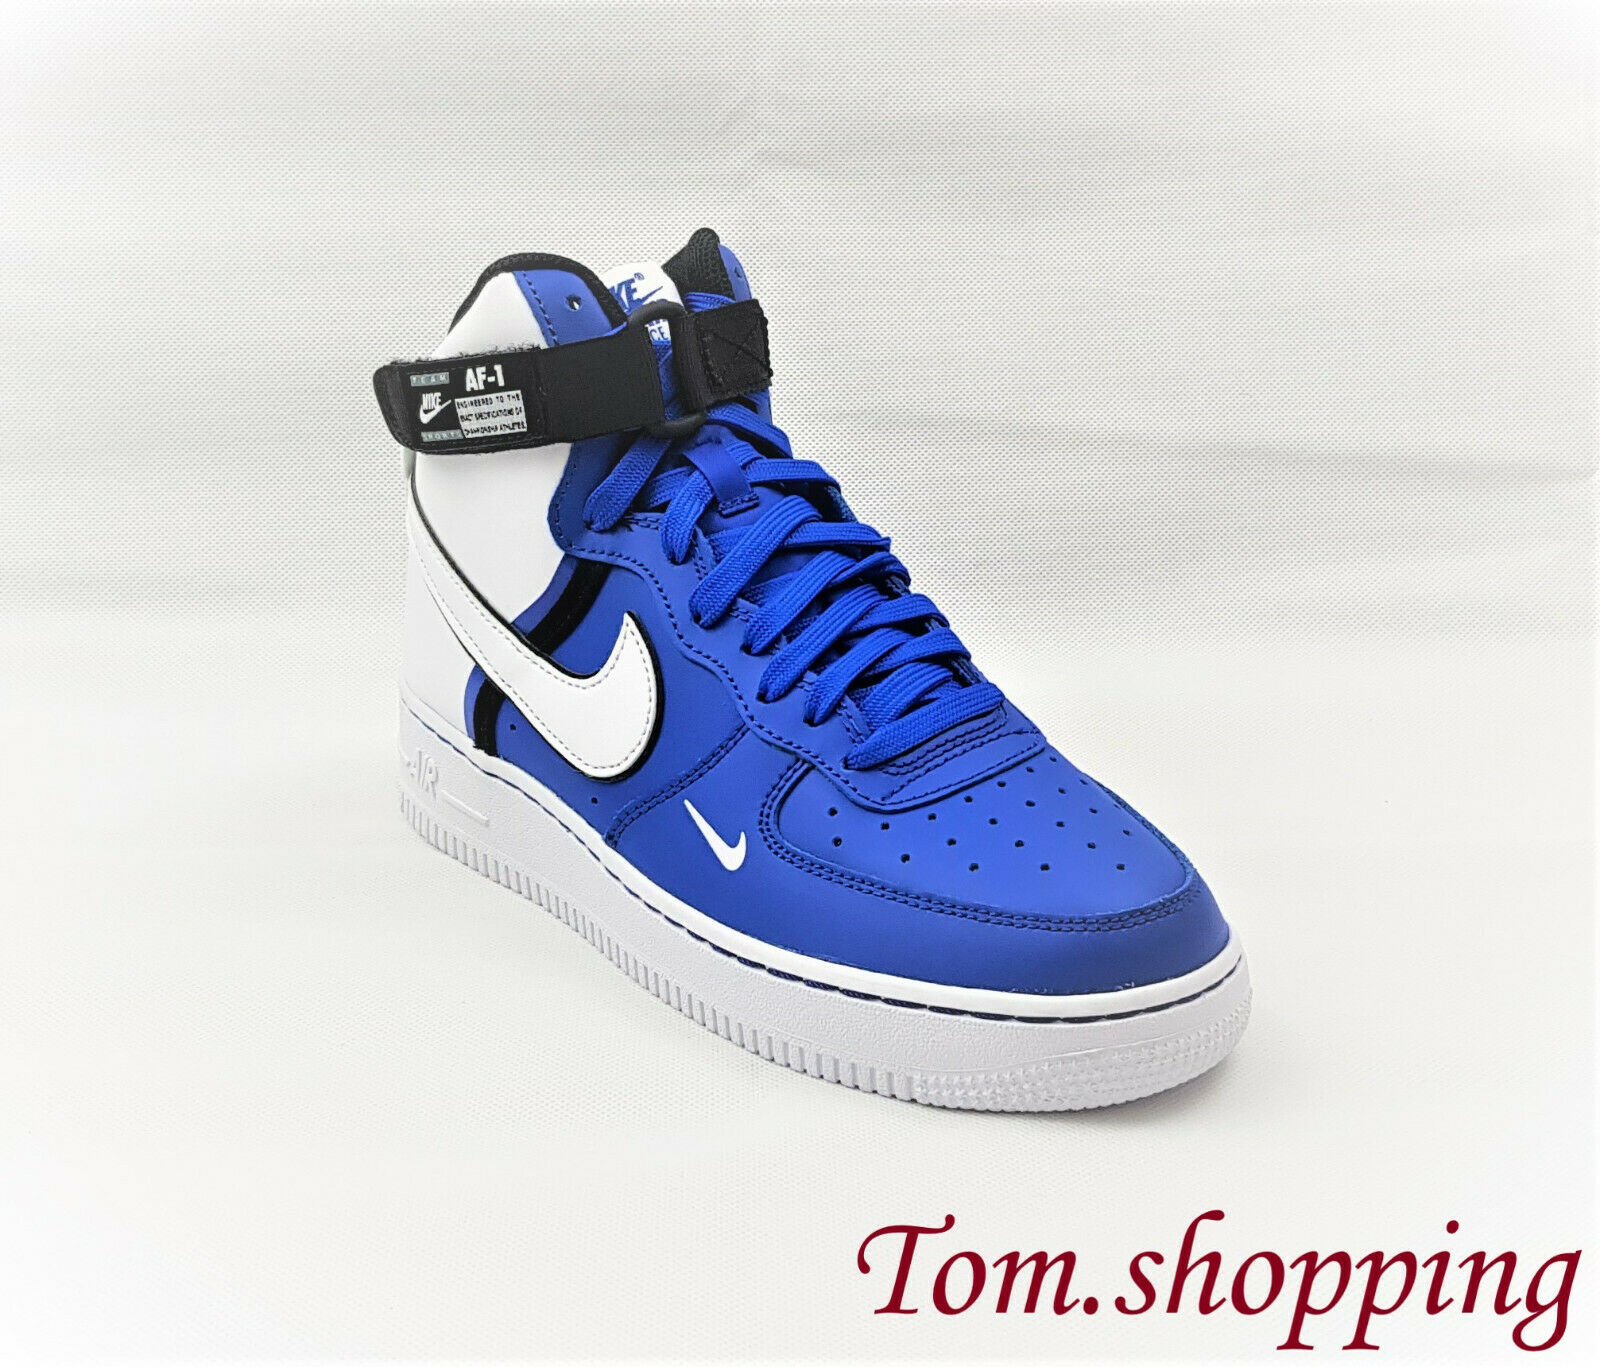 Nike Air Force 1 High LV8 2 CI2164 400 shoes white blue Size UK 5 EUR 38